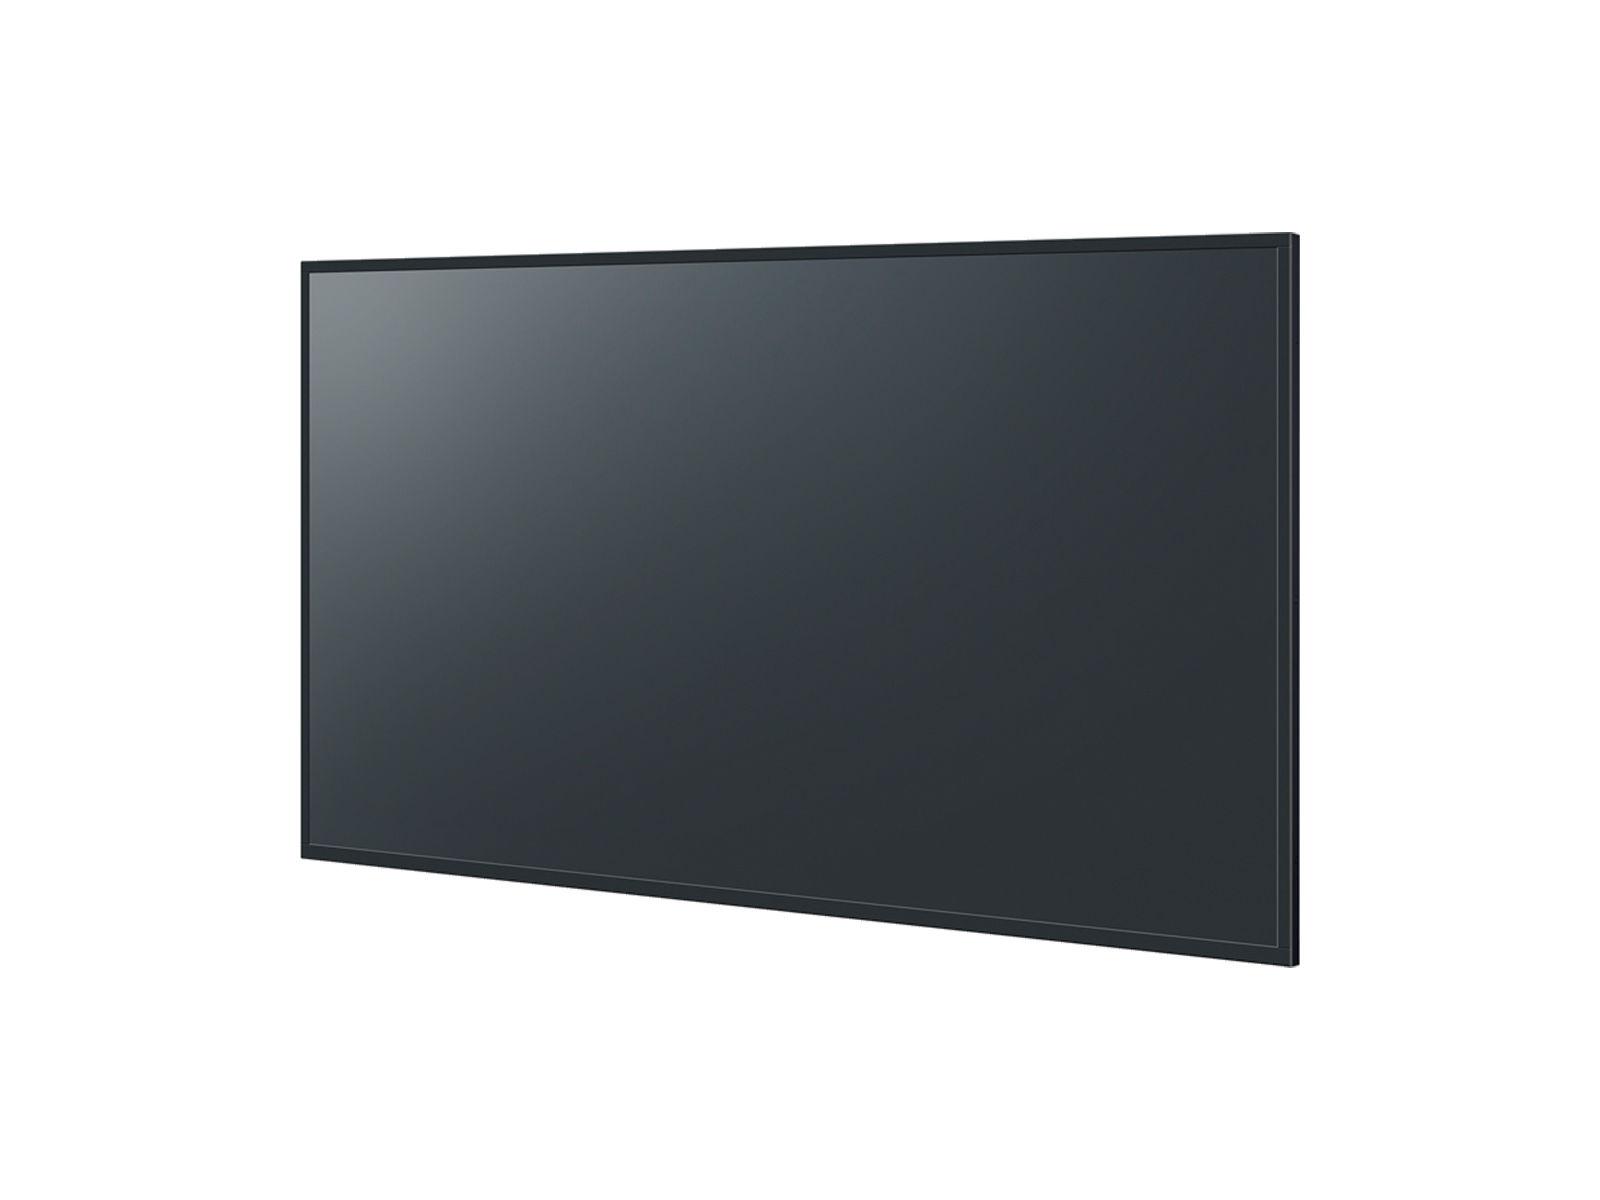 "Panasonic TH-75EQ1 | 189 cm 75"" UHD LCD-Display, LED, 350 cd/m²,, LAN, USB Mediaplayer, Lautsprecher, schwarz"